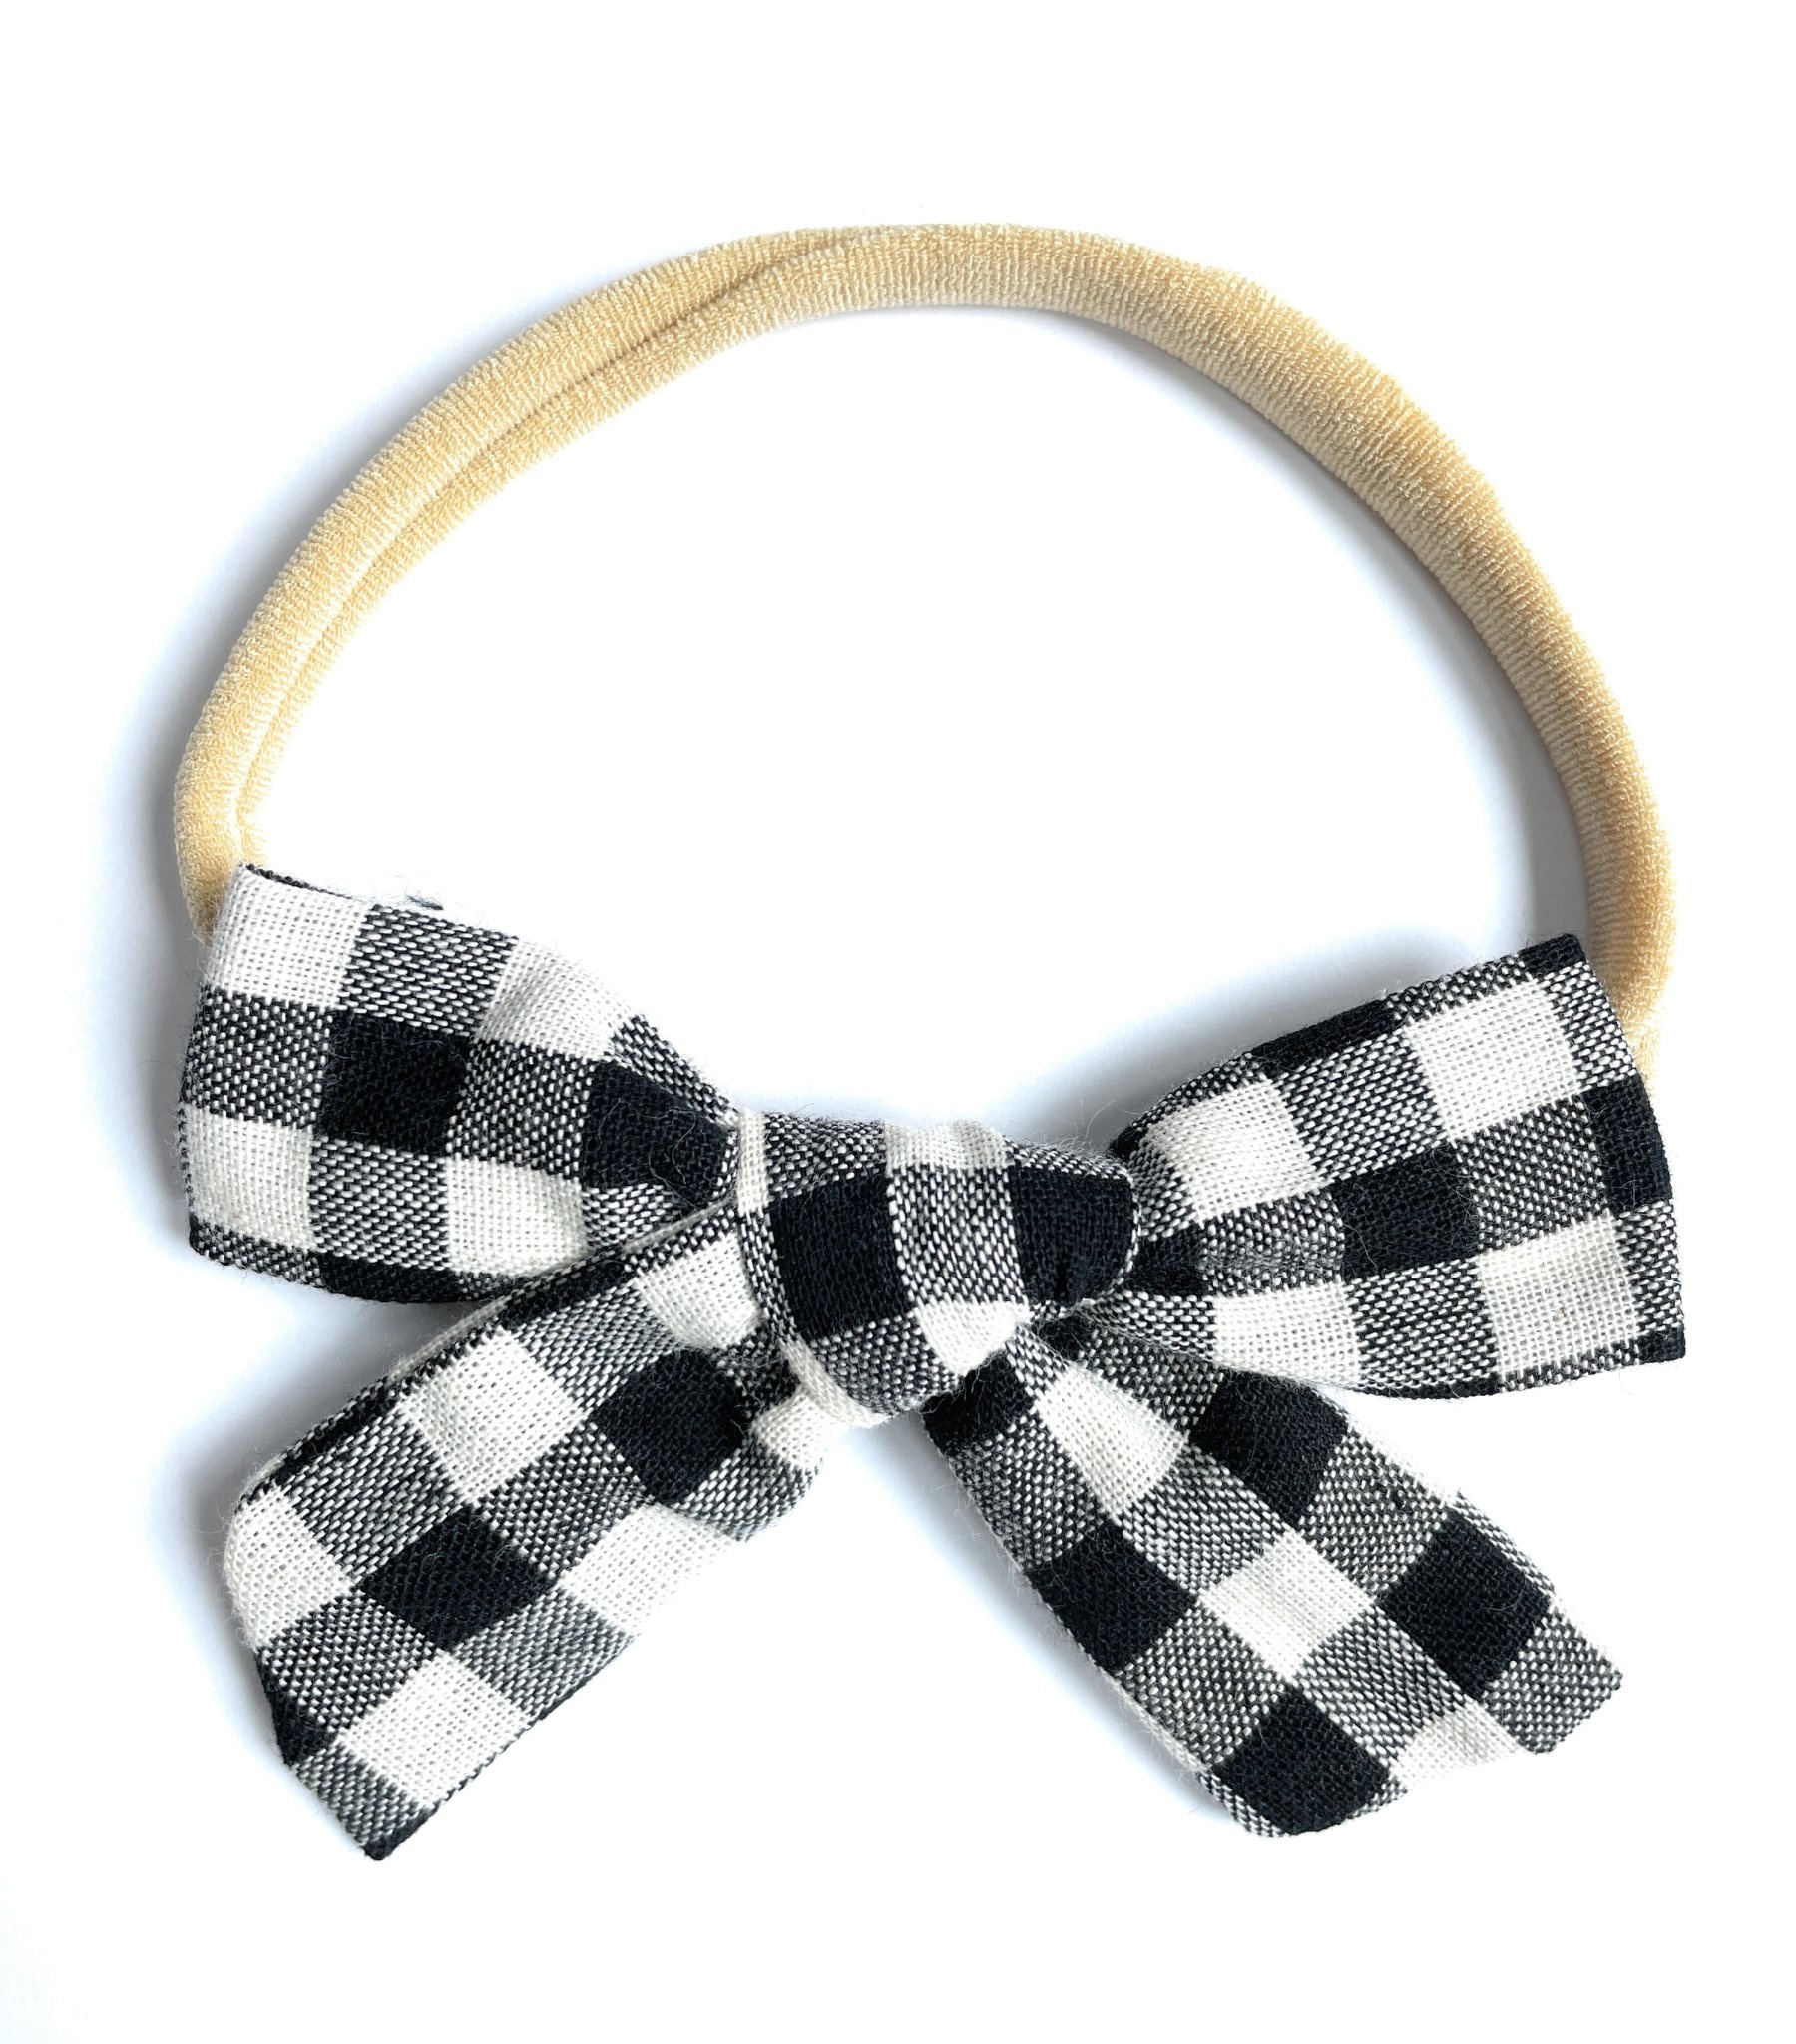 Baby Wisp - Handtied Bow - White Buffalo Plaid